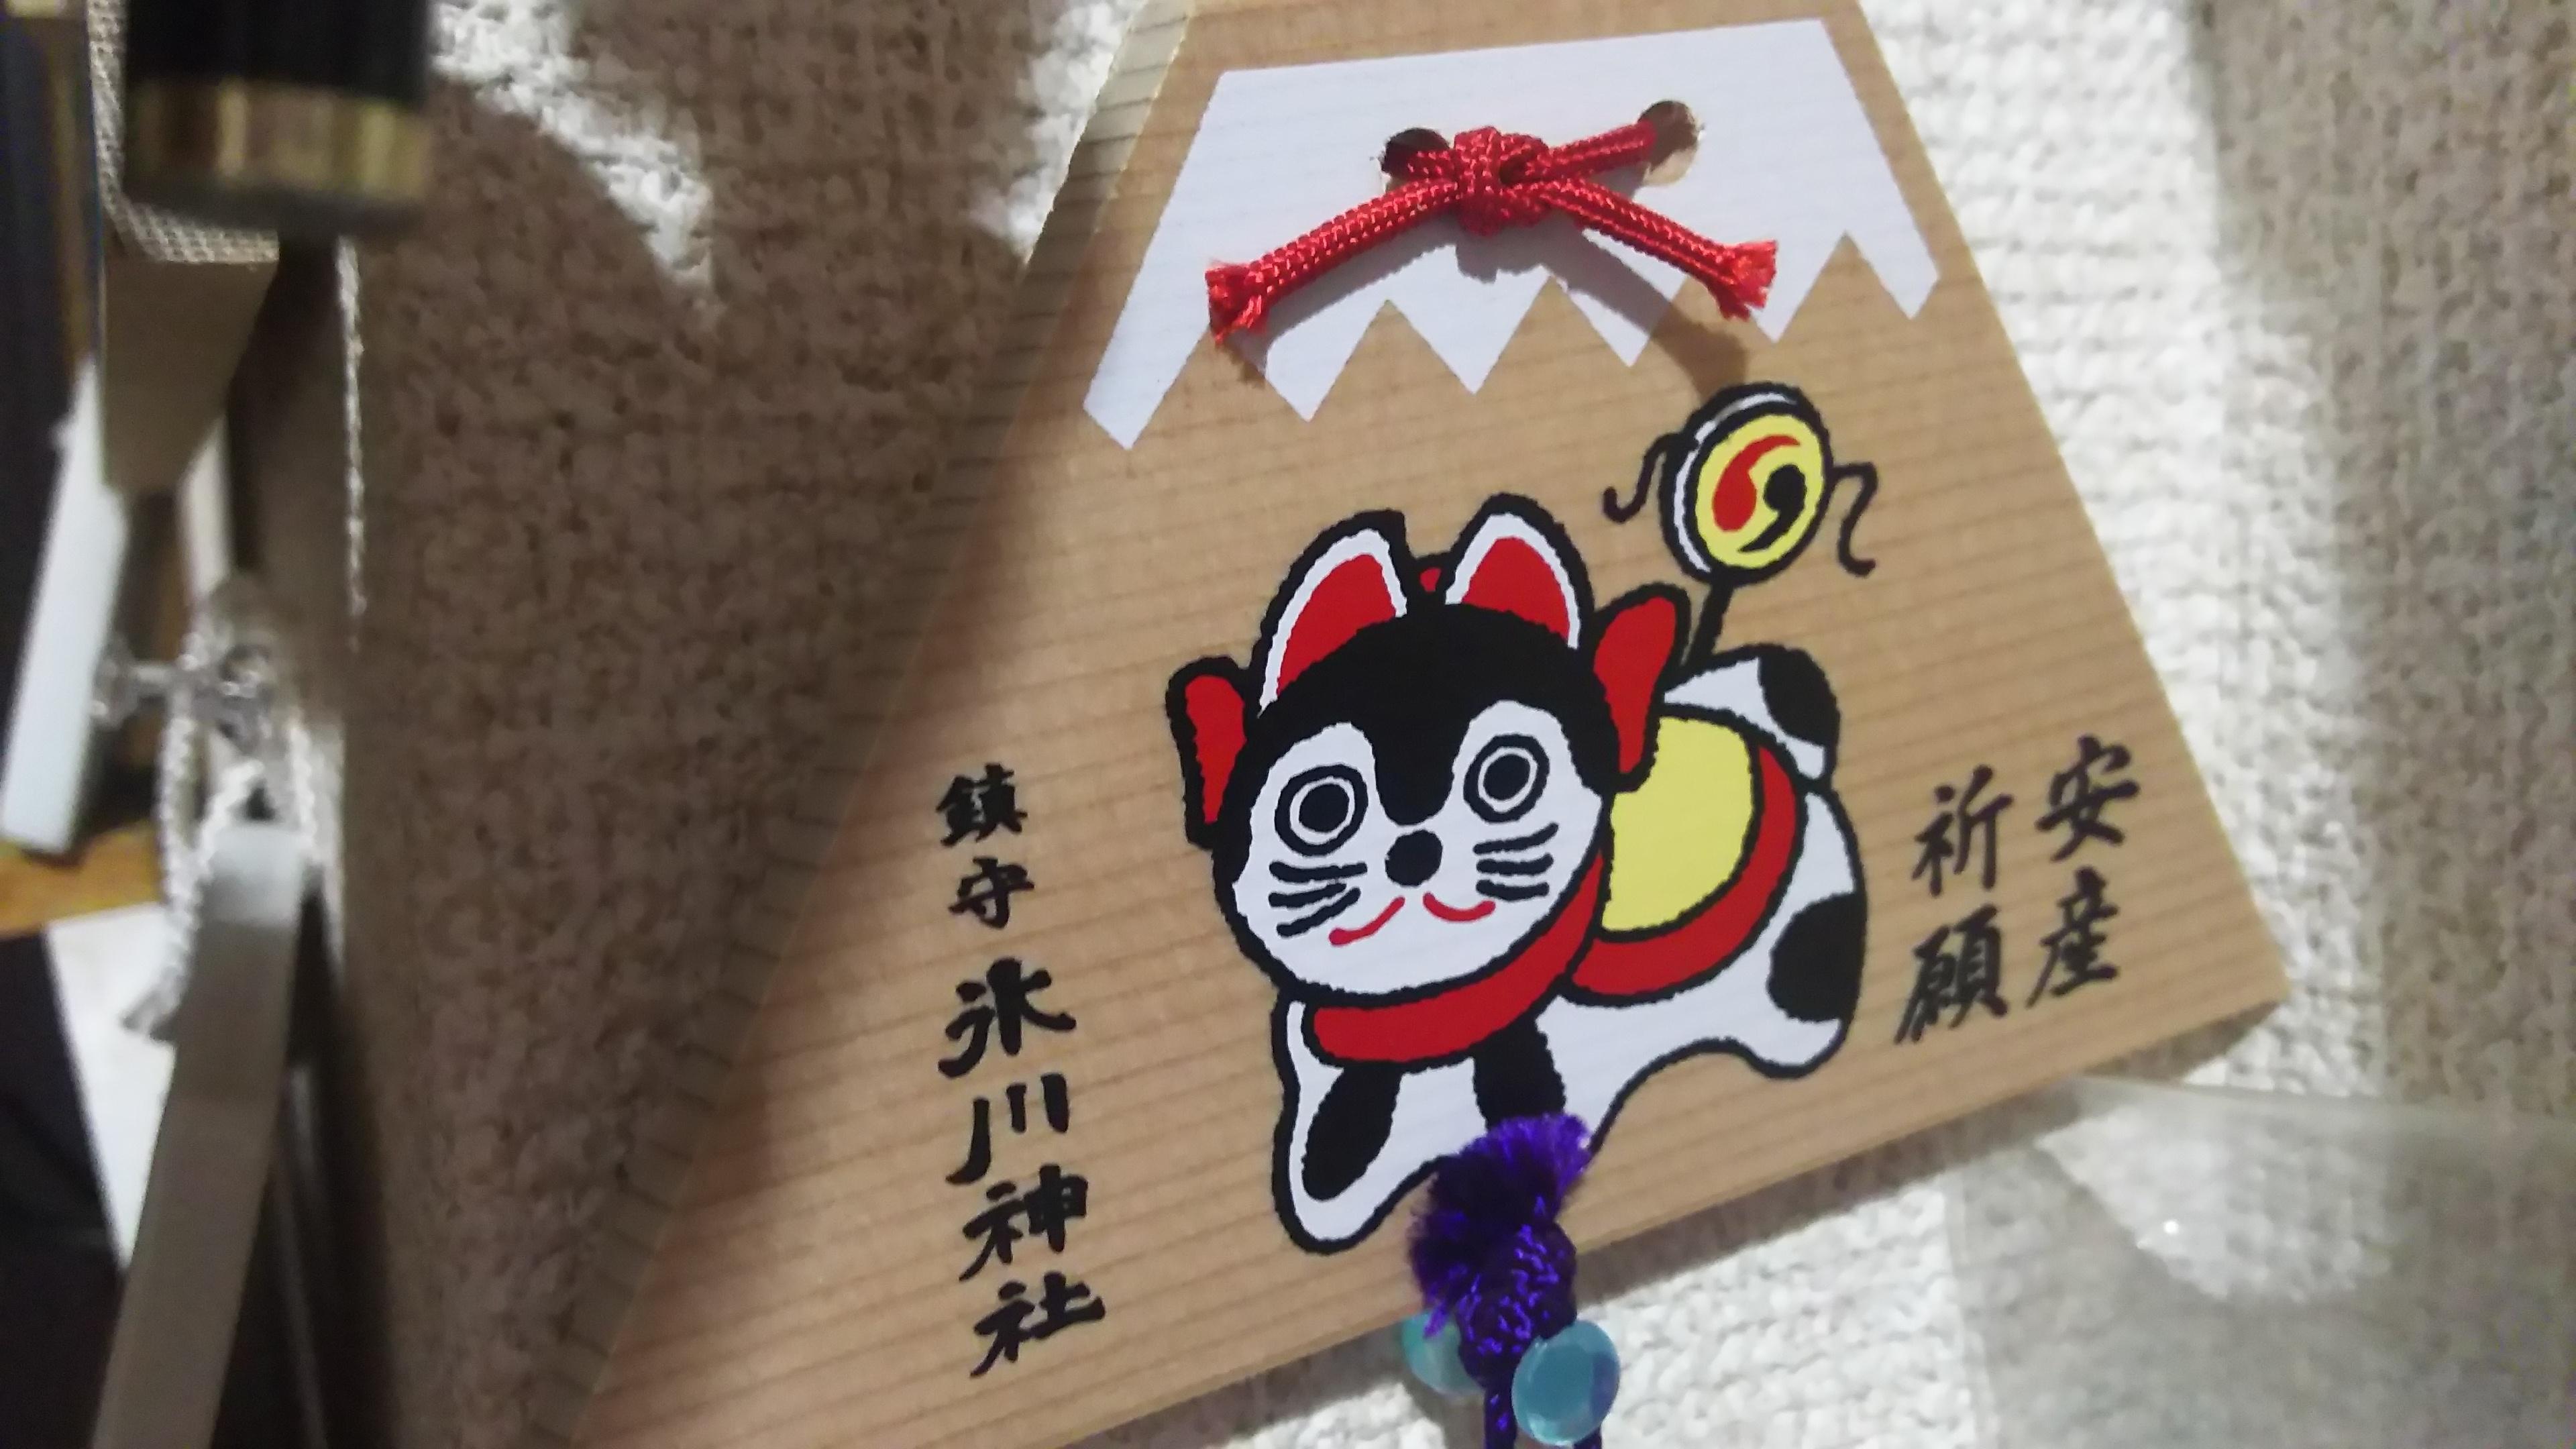 鎮守氷川神社の絵馬